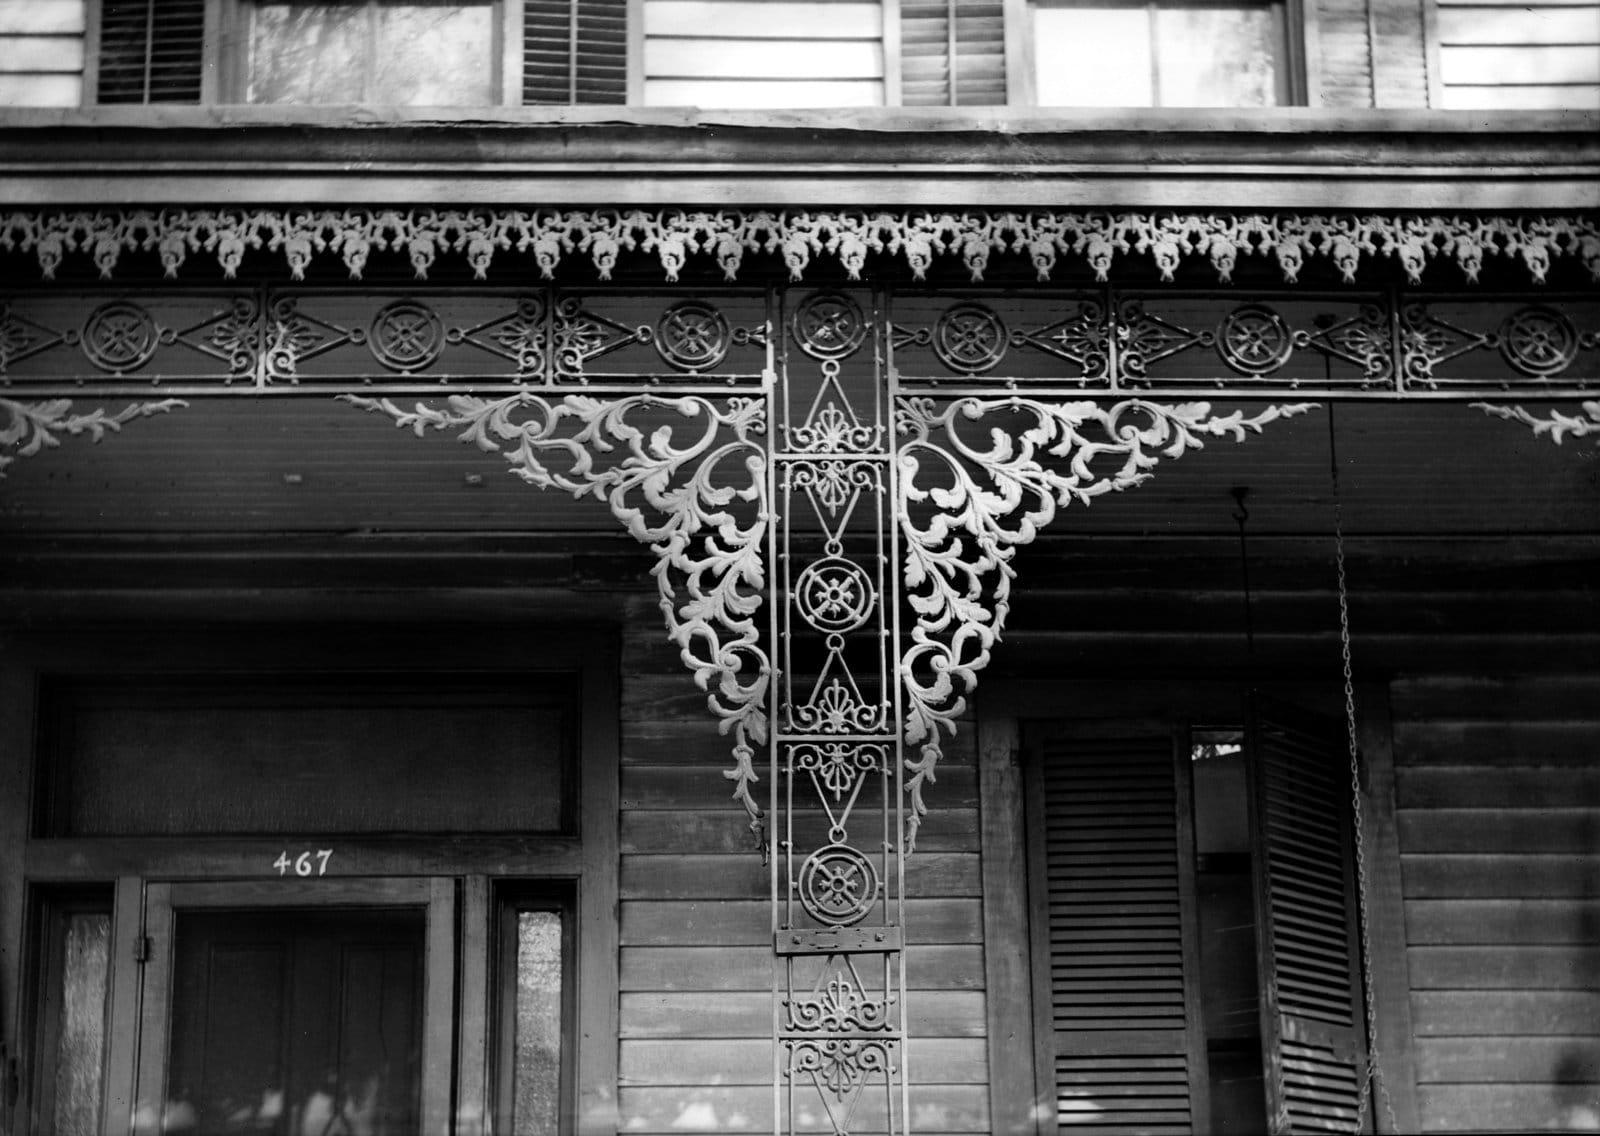 Iron lace at 467 Greene Street in Augusta, Georgia (c1930s)